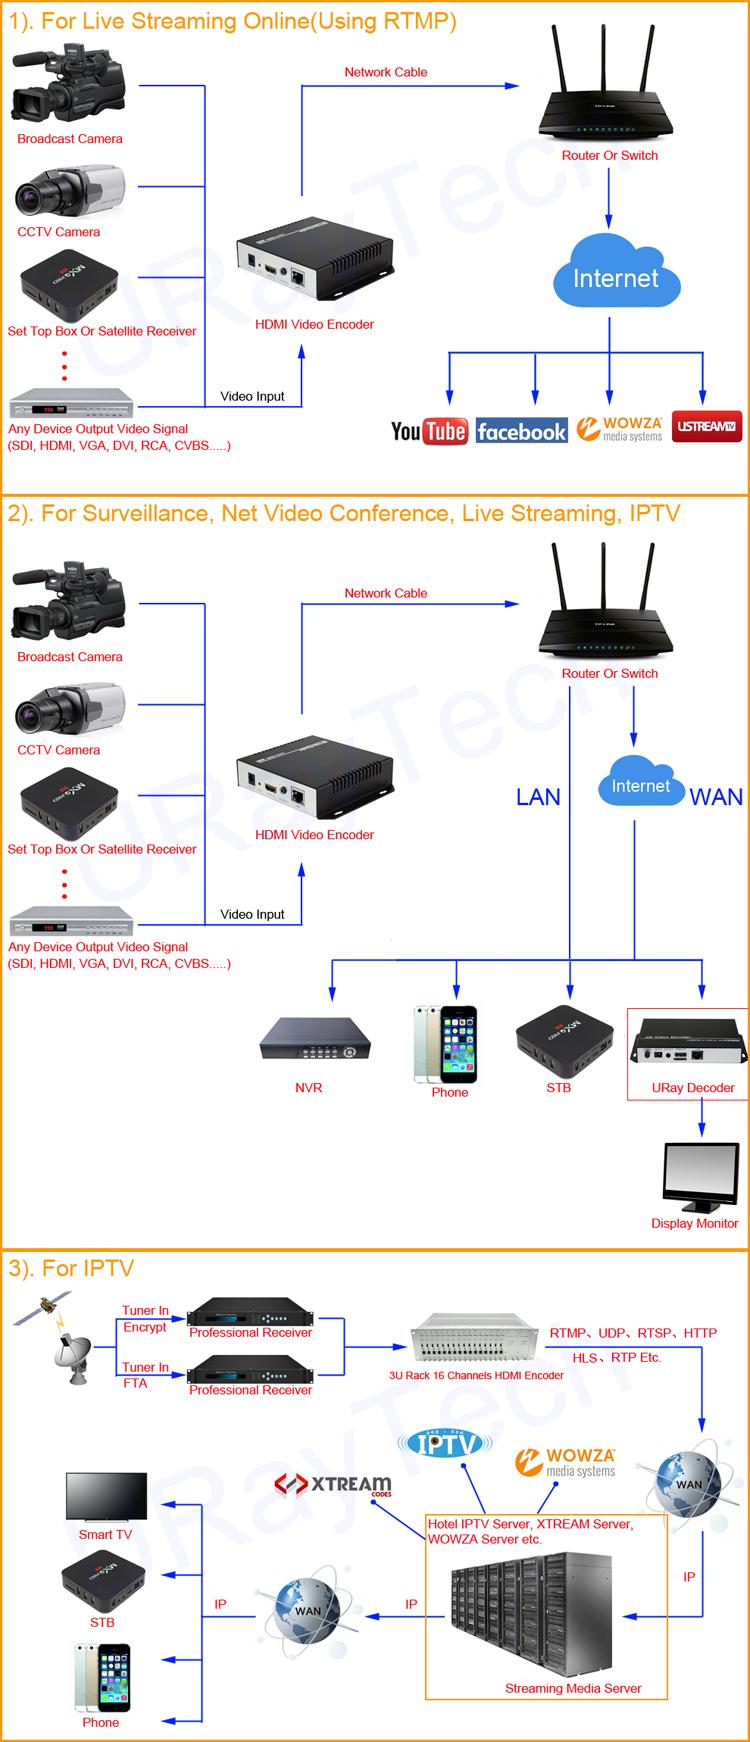 Video Streaming Hardware Hdmi Encoder Iptv Cable Tv Digital Encoder For  Wowza Fms Server Onvif Application - Buy Onvif Encoder,Digital Encoder,Hdmi